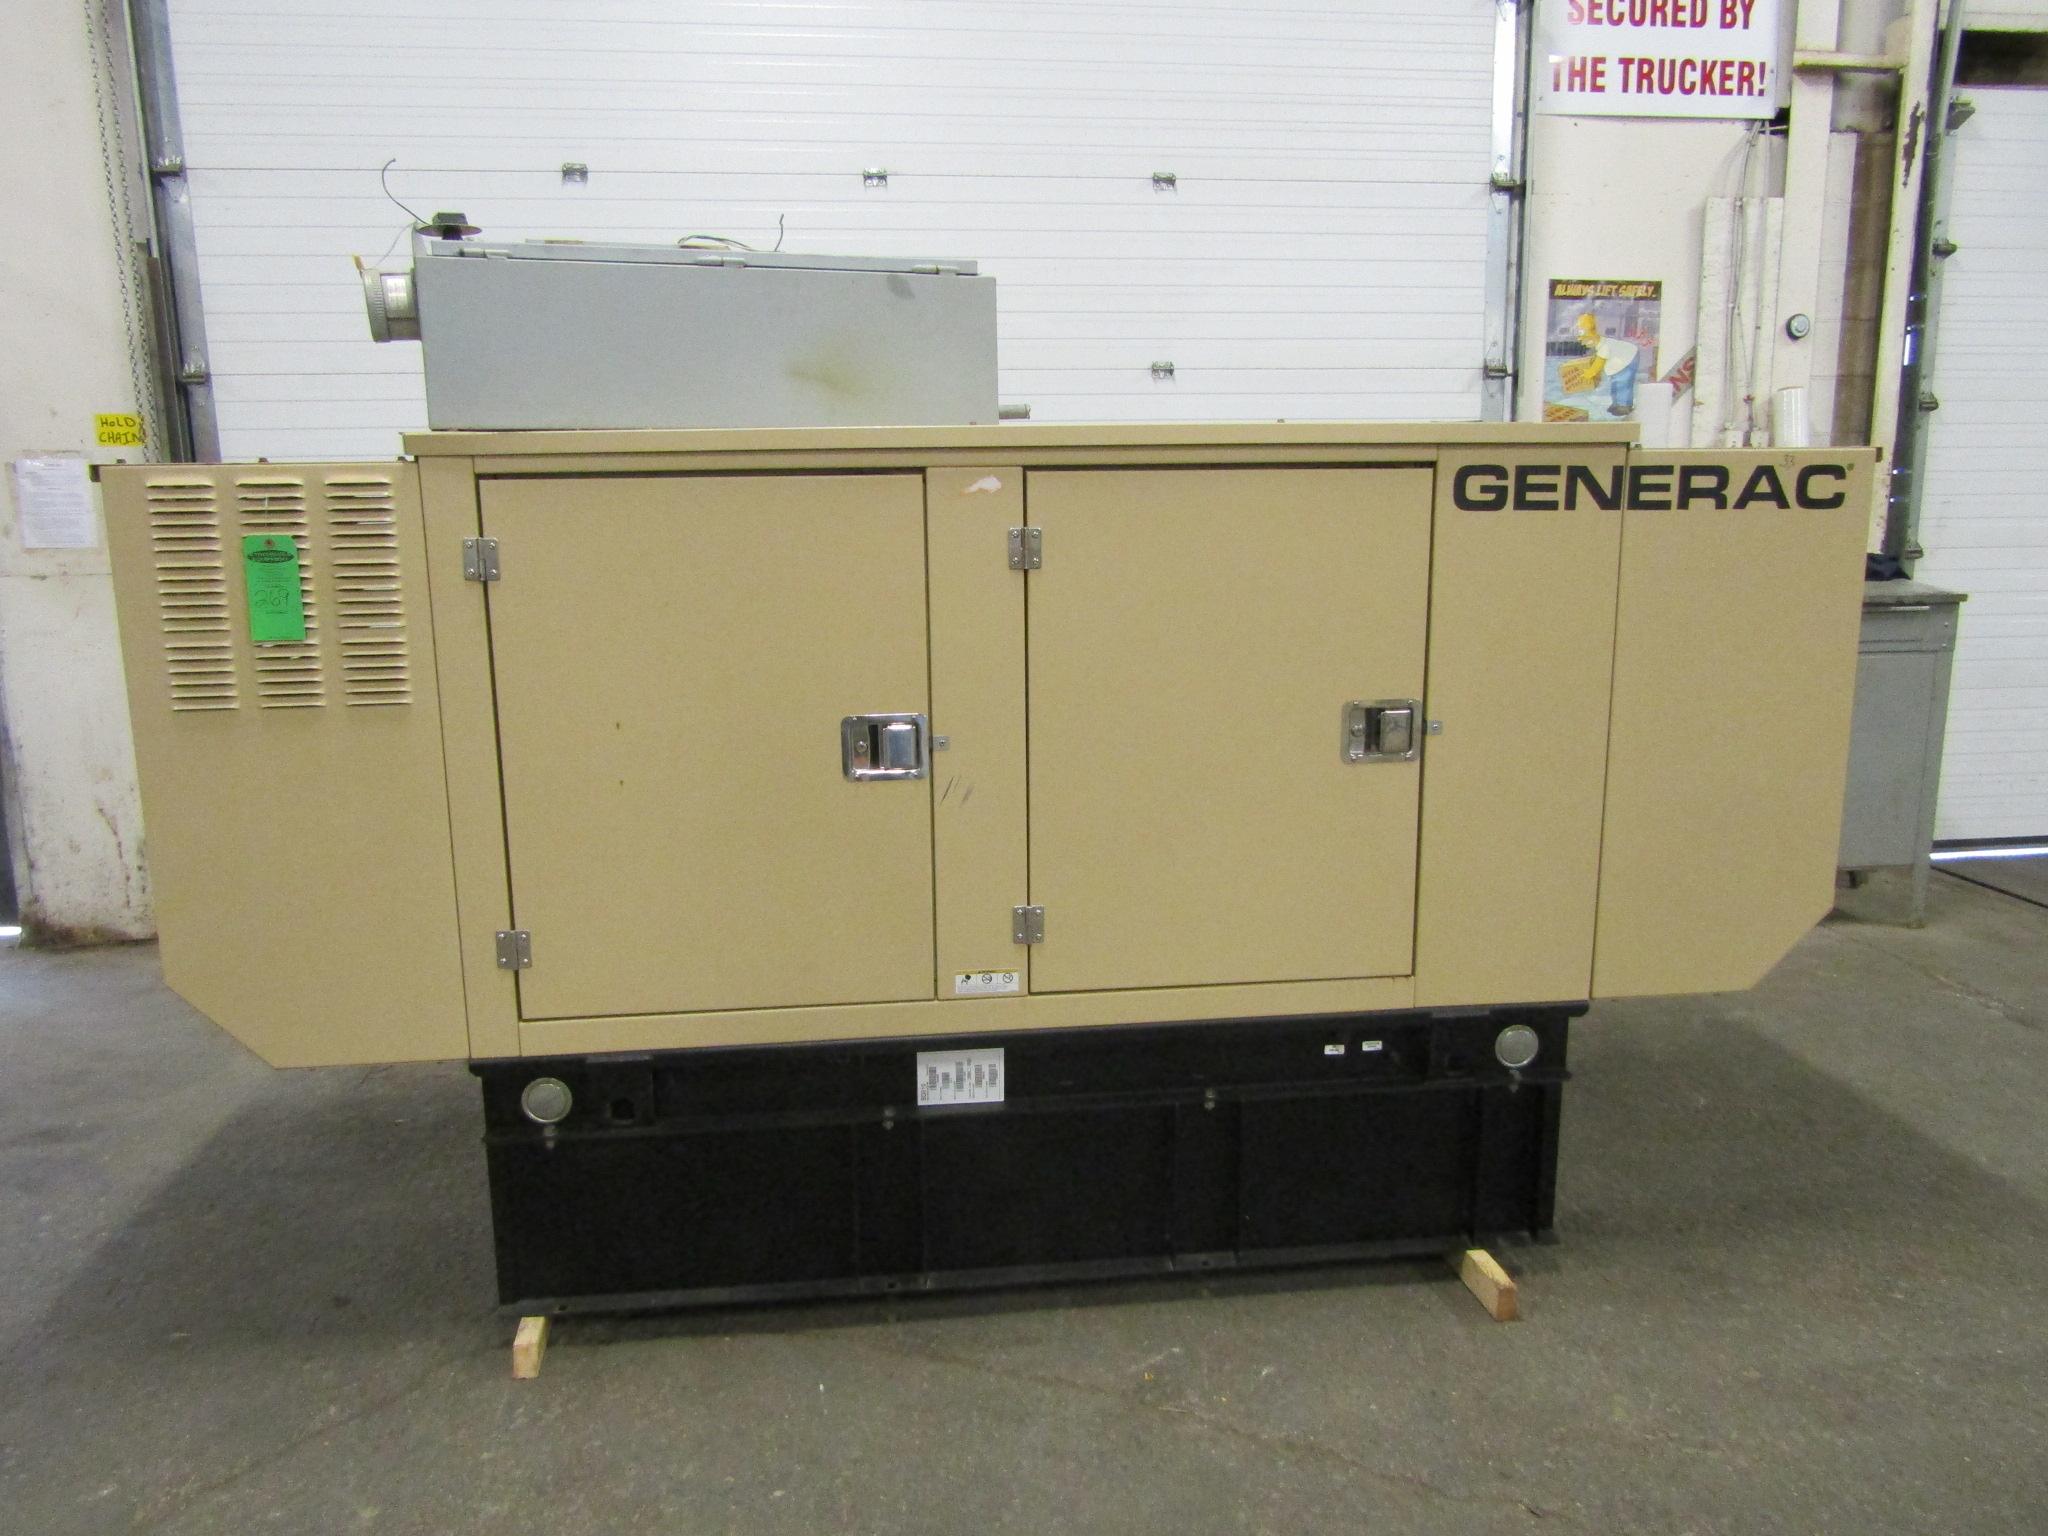 2007 Generac Diesel Generator model 10 KW 10 KVA